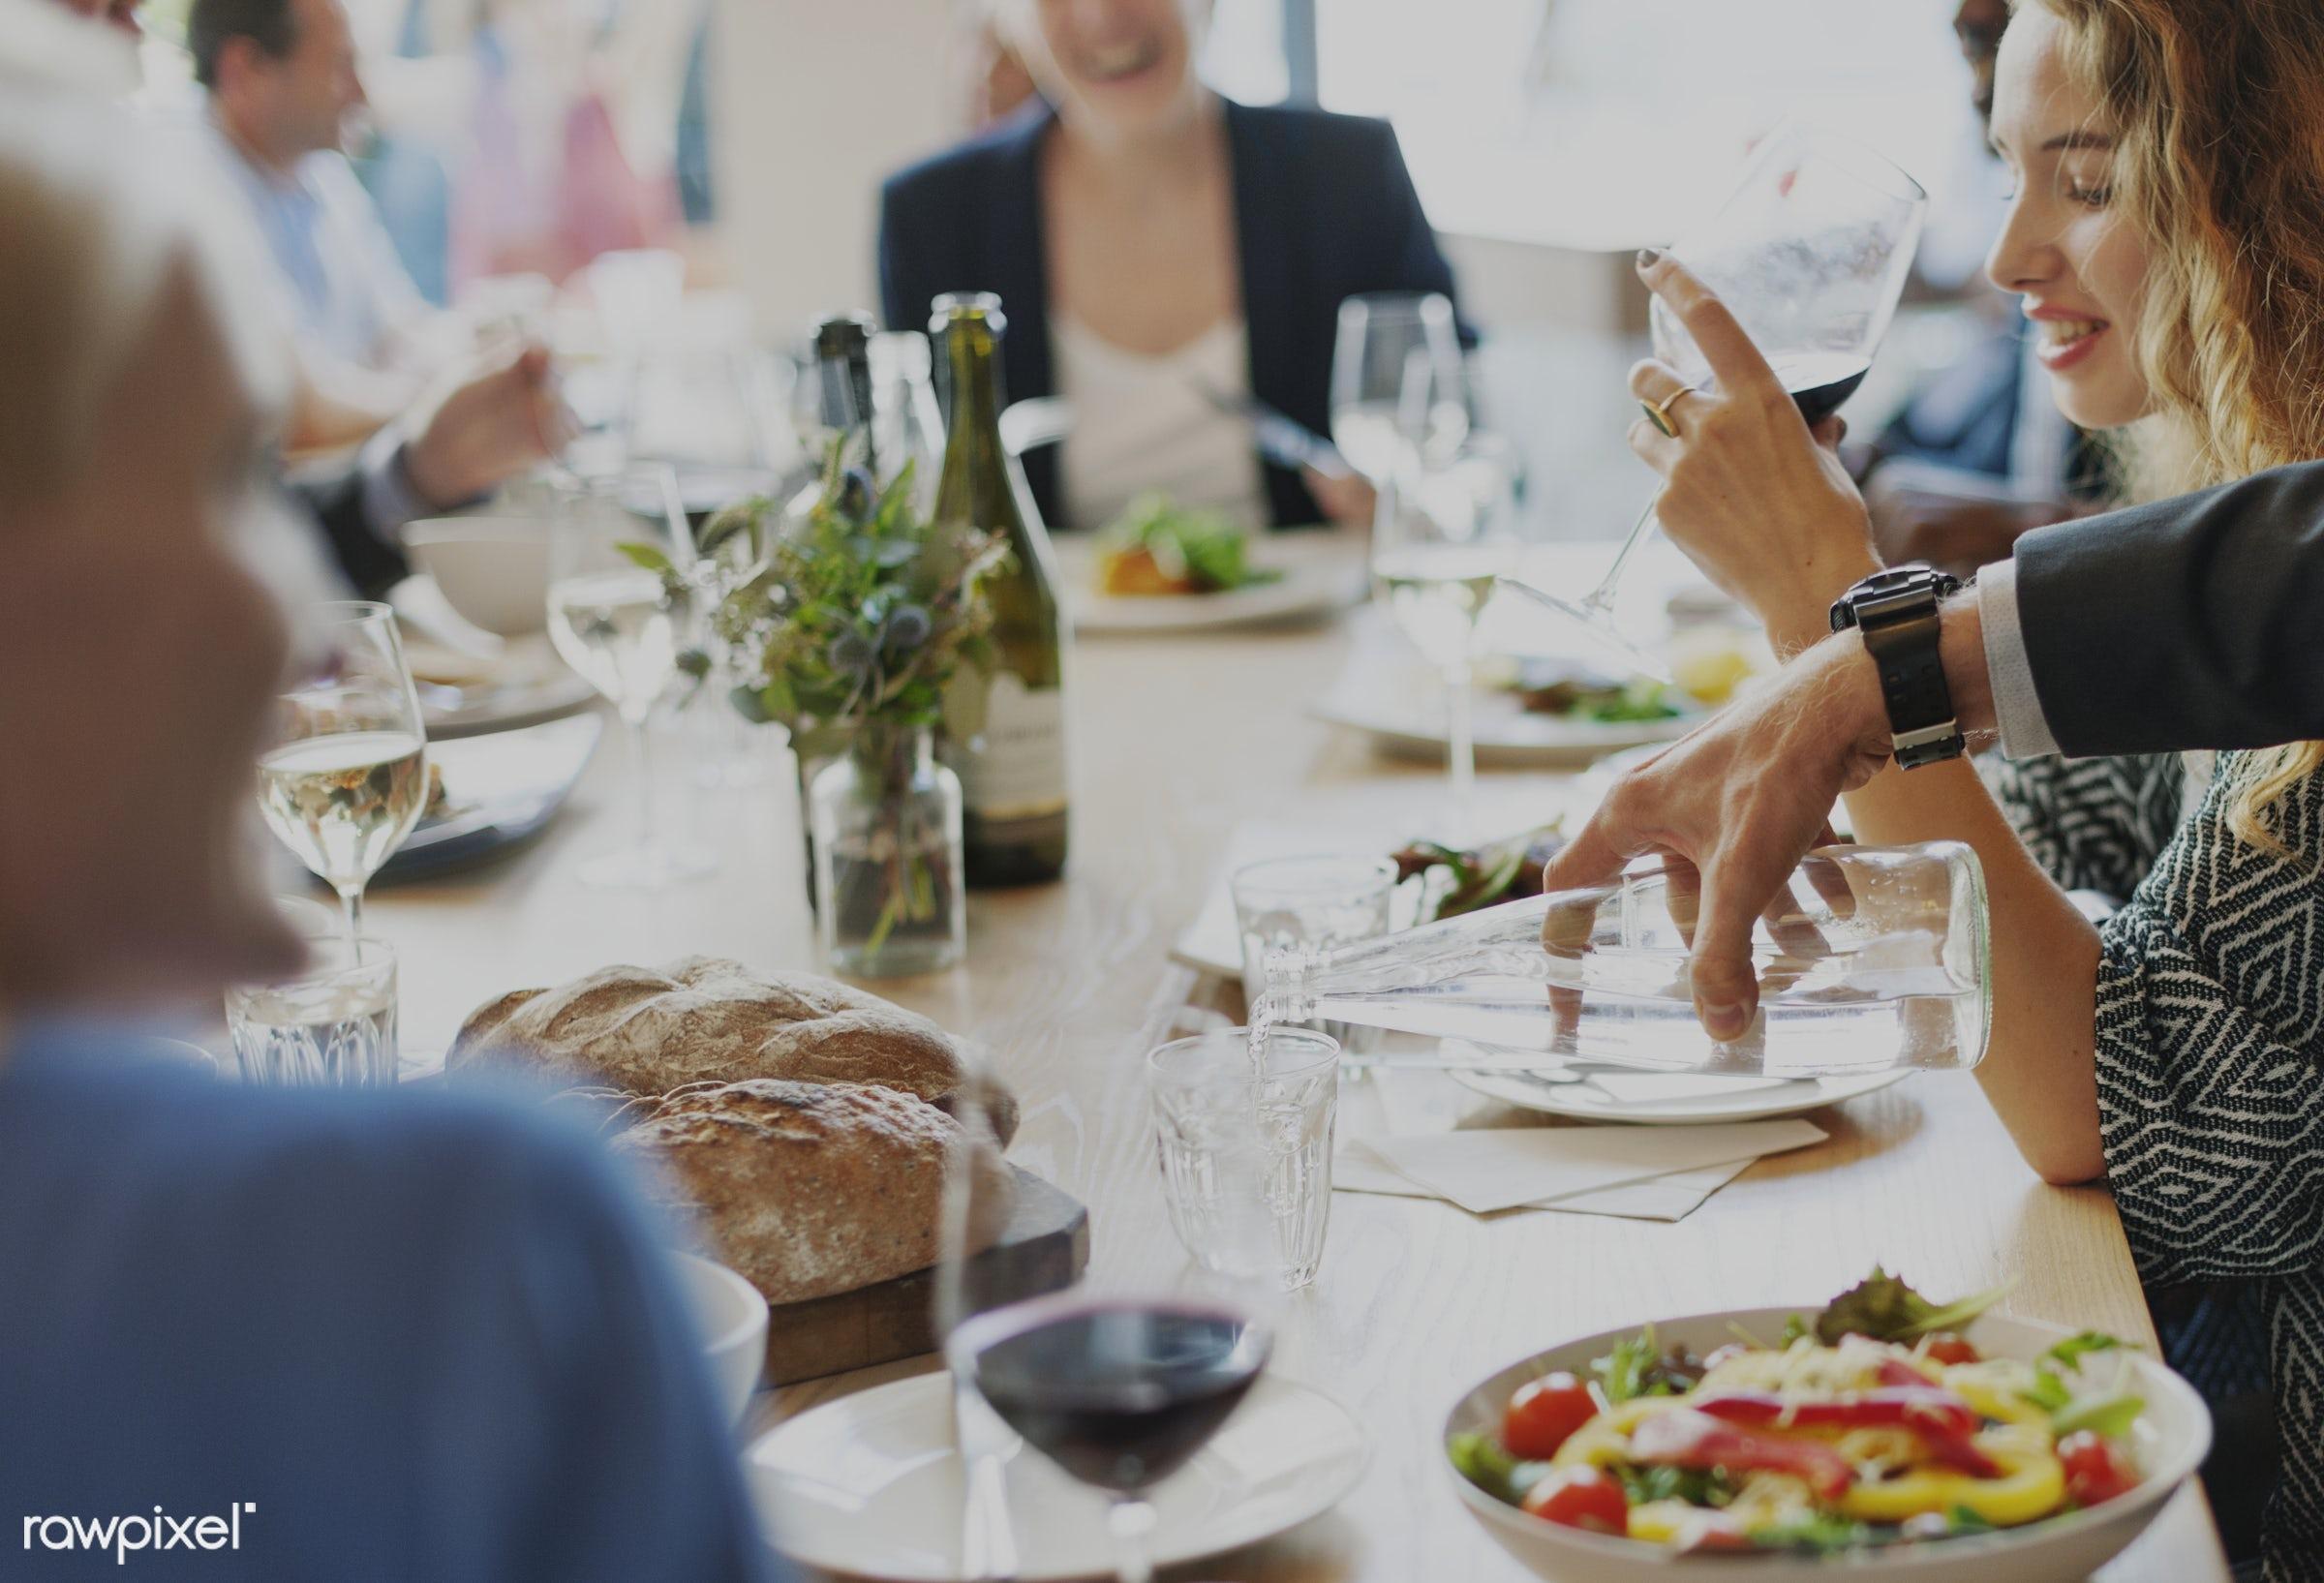 buffet, adult, banquet, break, brunch, business, business people, businesswoman, cafe, casual, catering, caucasian,...